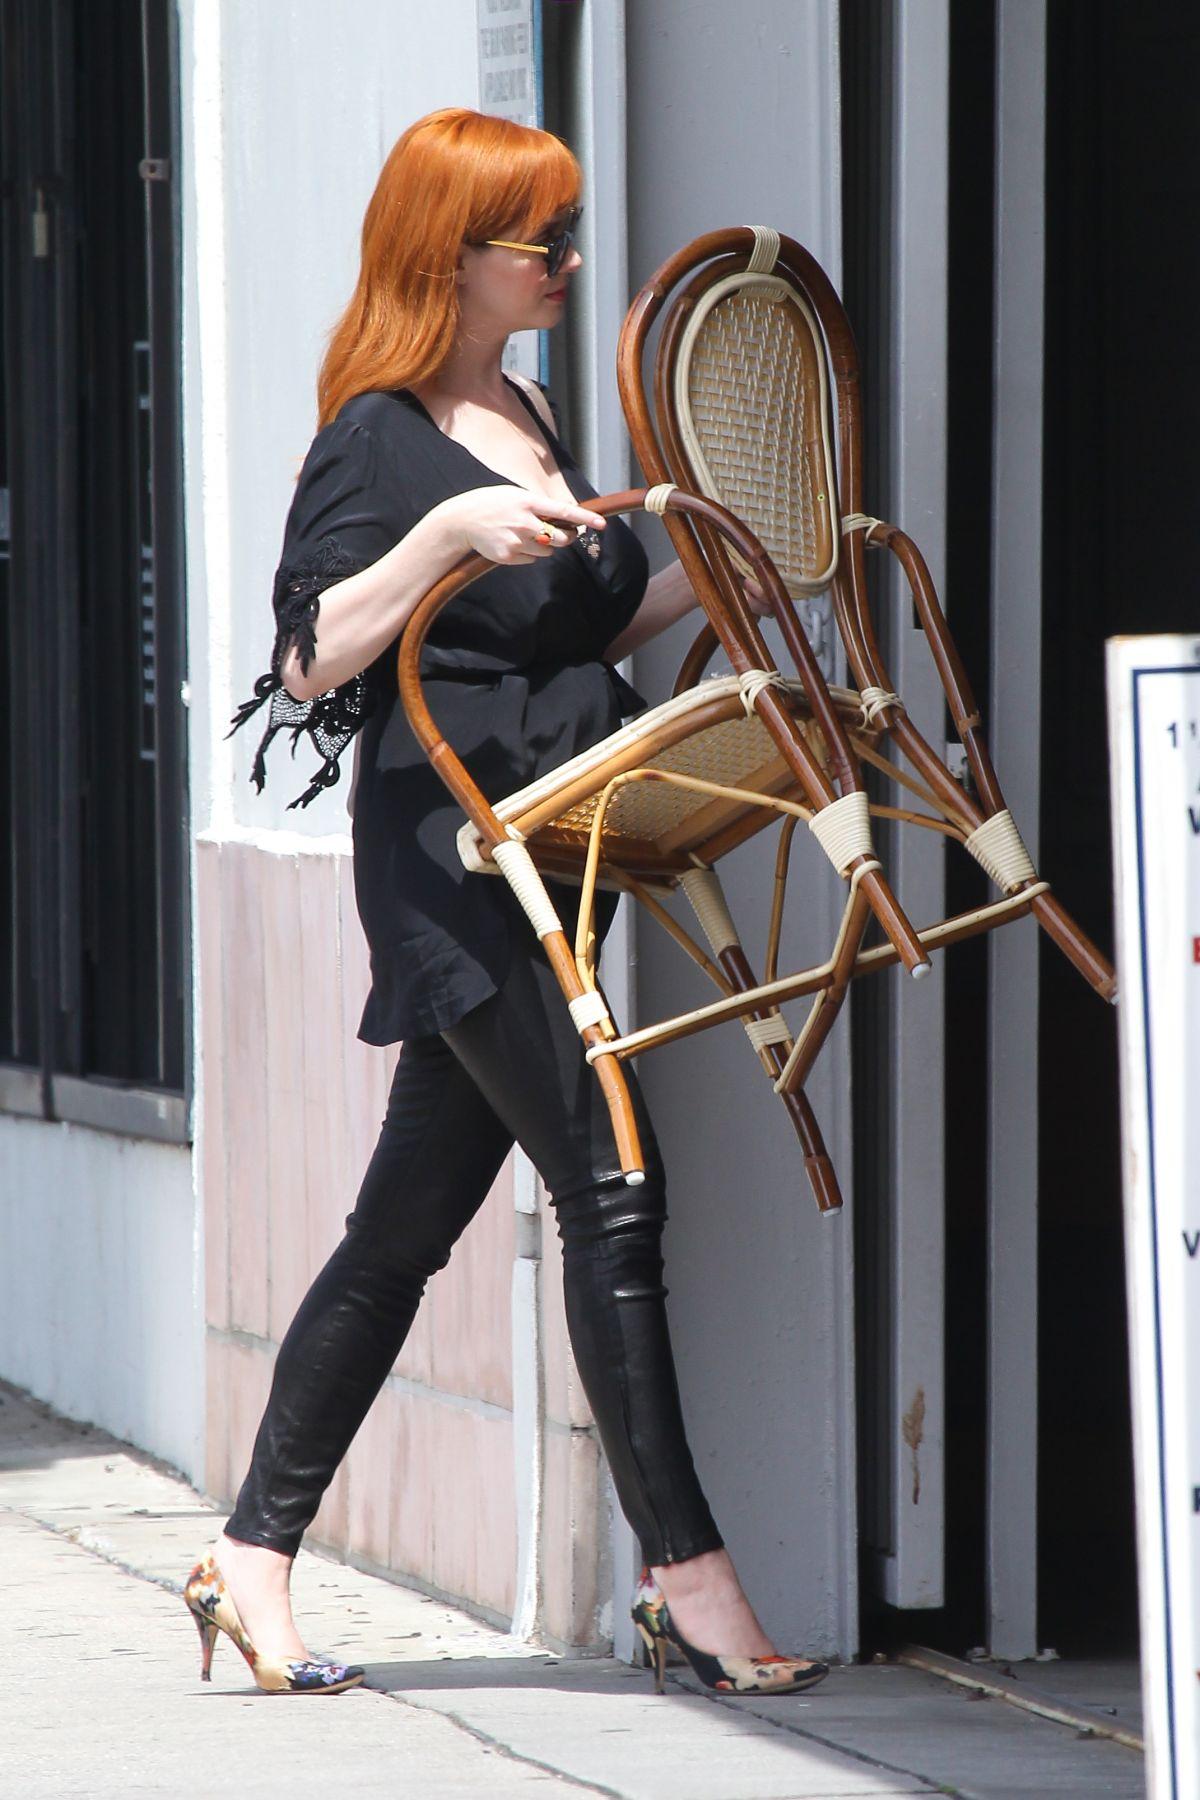 Christina Hendricks Out Shopping In LA - Celebzz - Celebzz